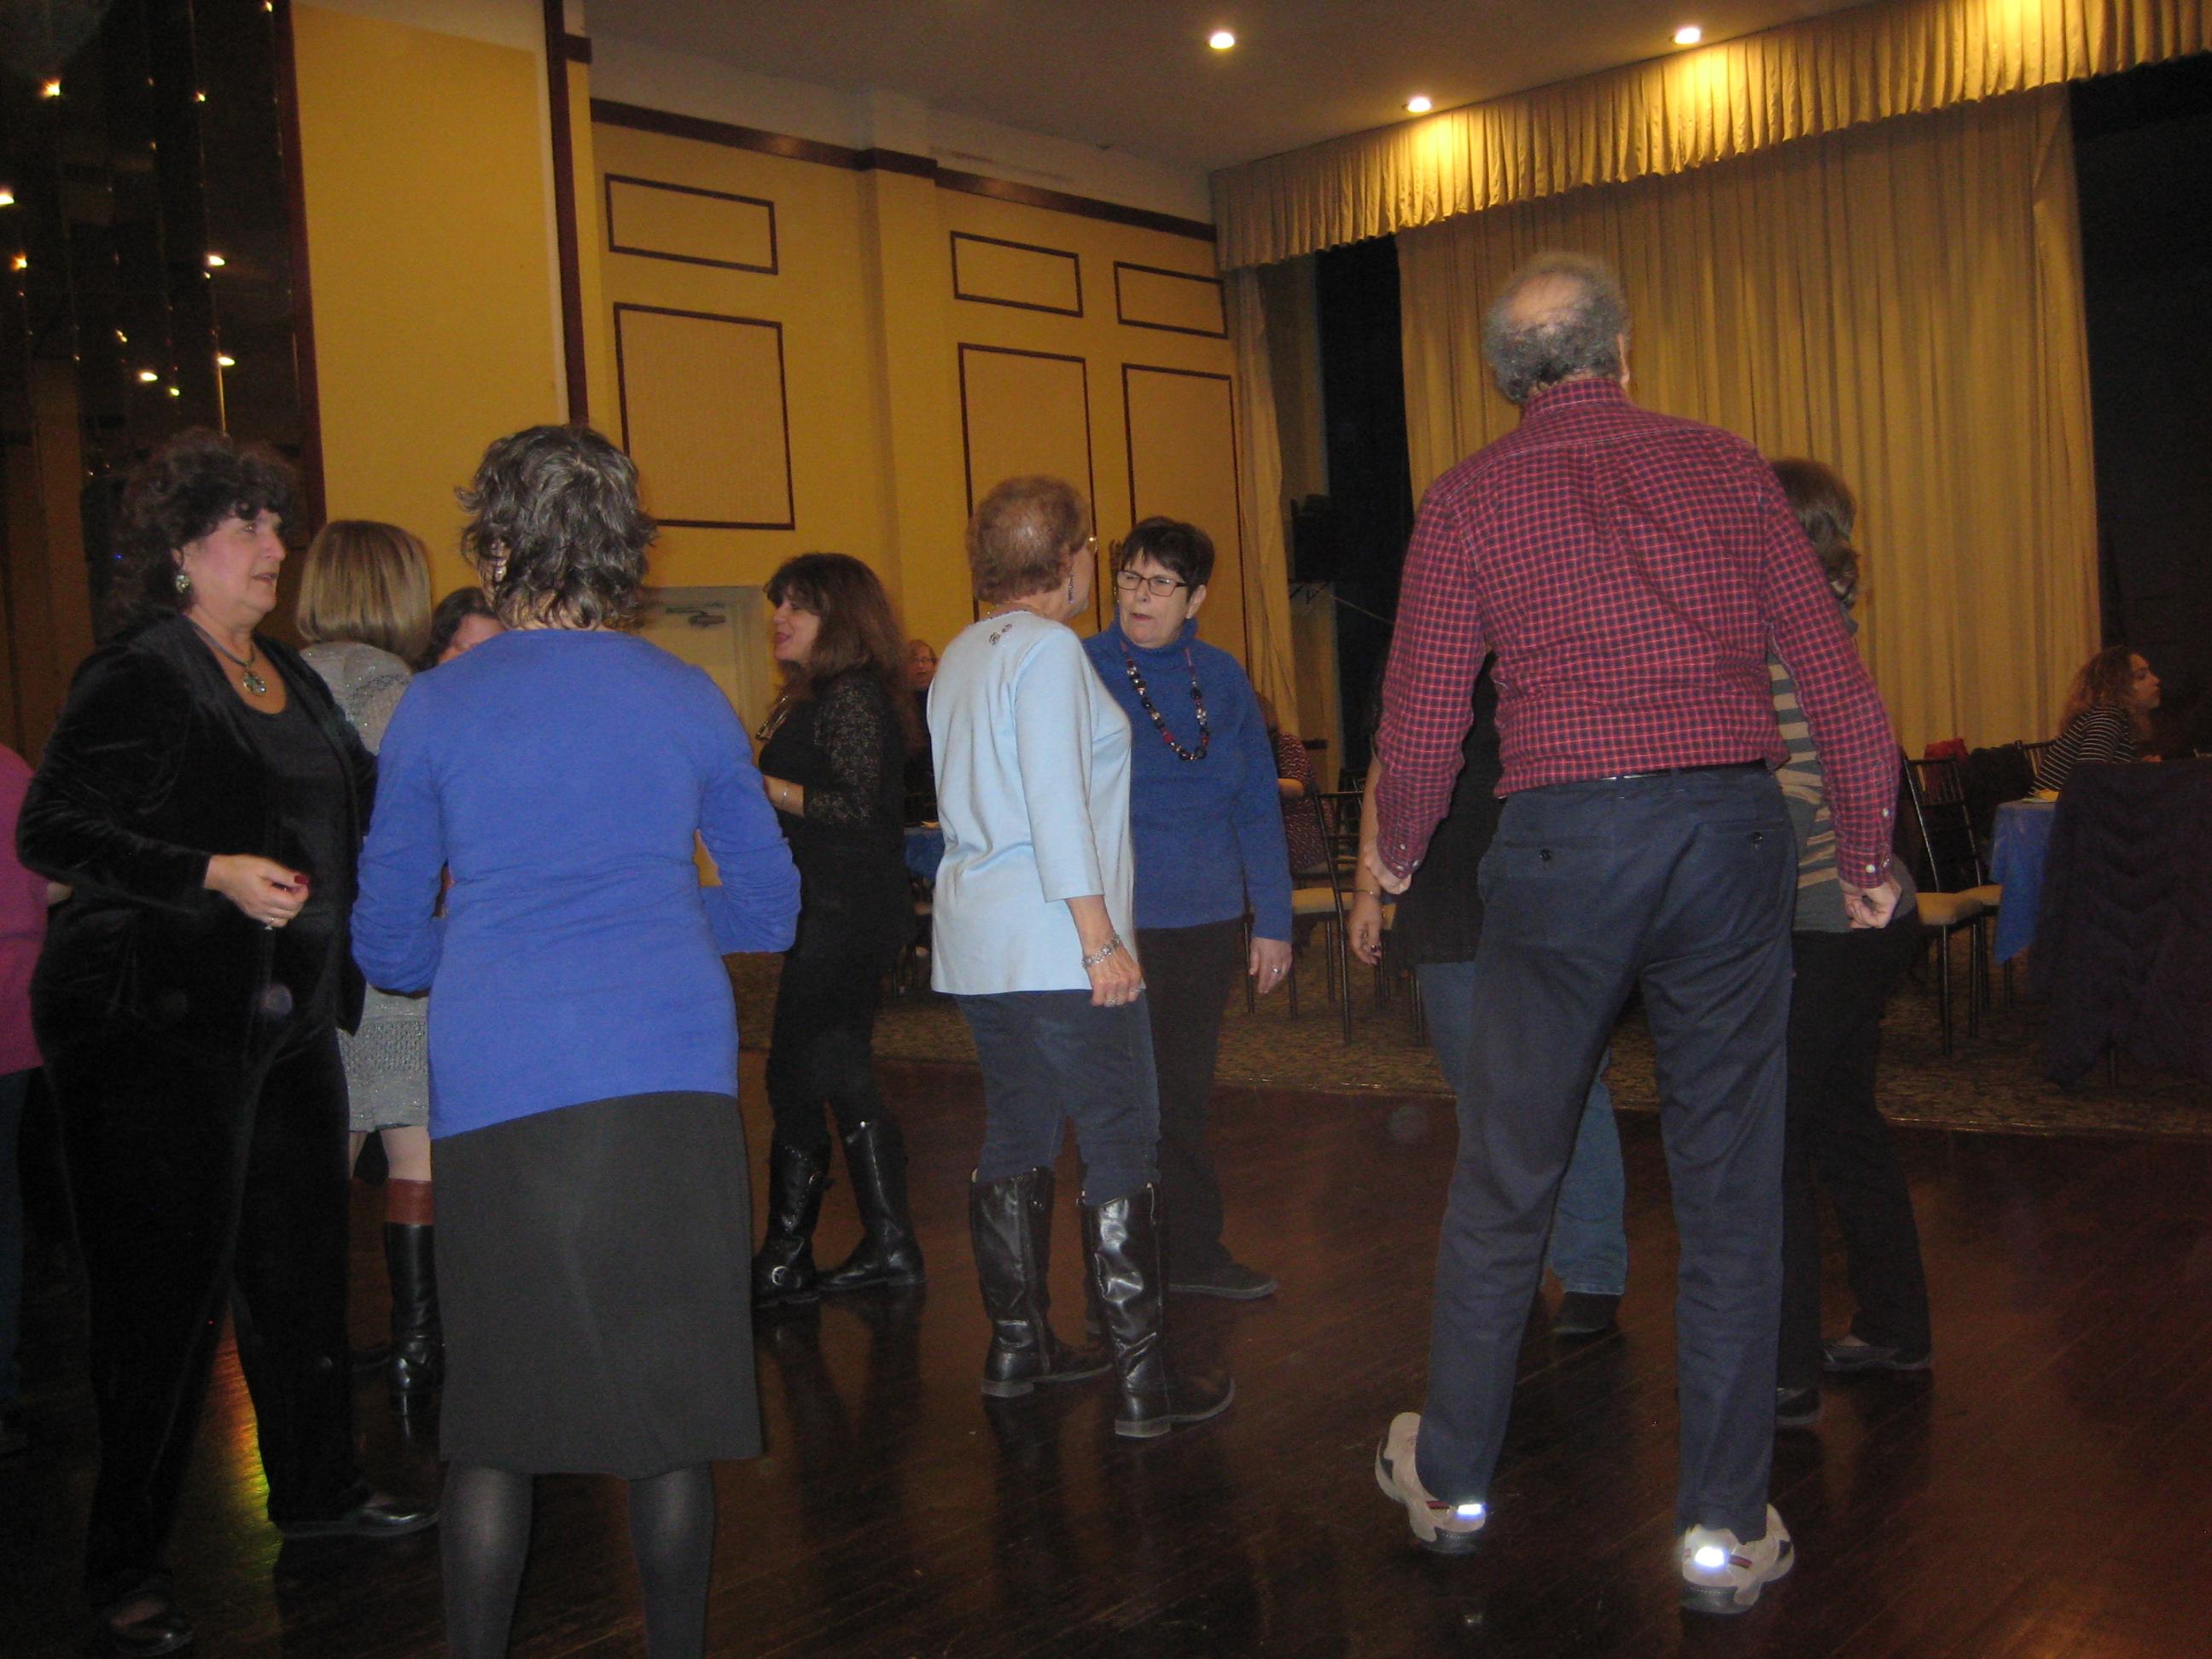 2015 Vodka and Latkes dancing